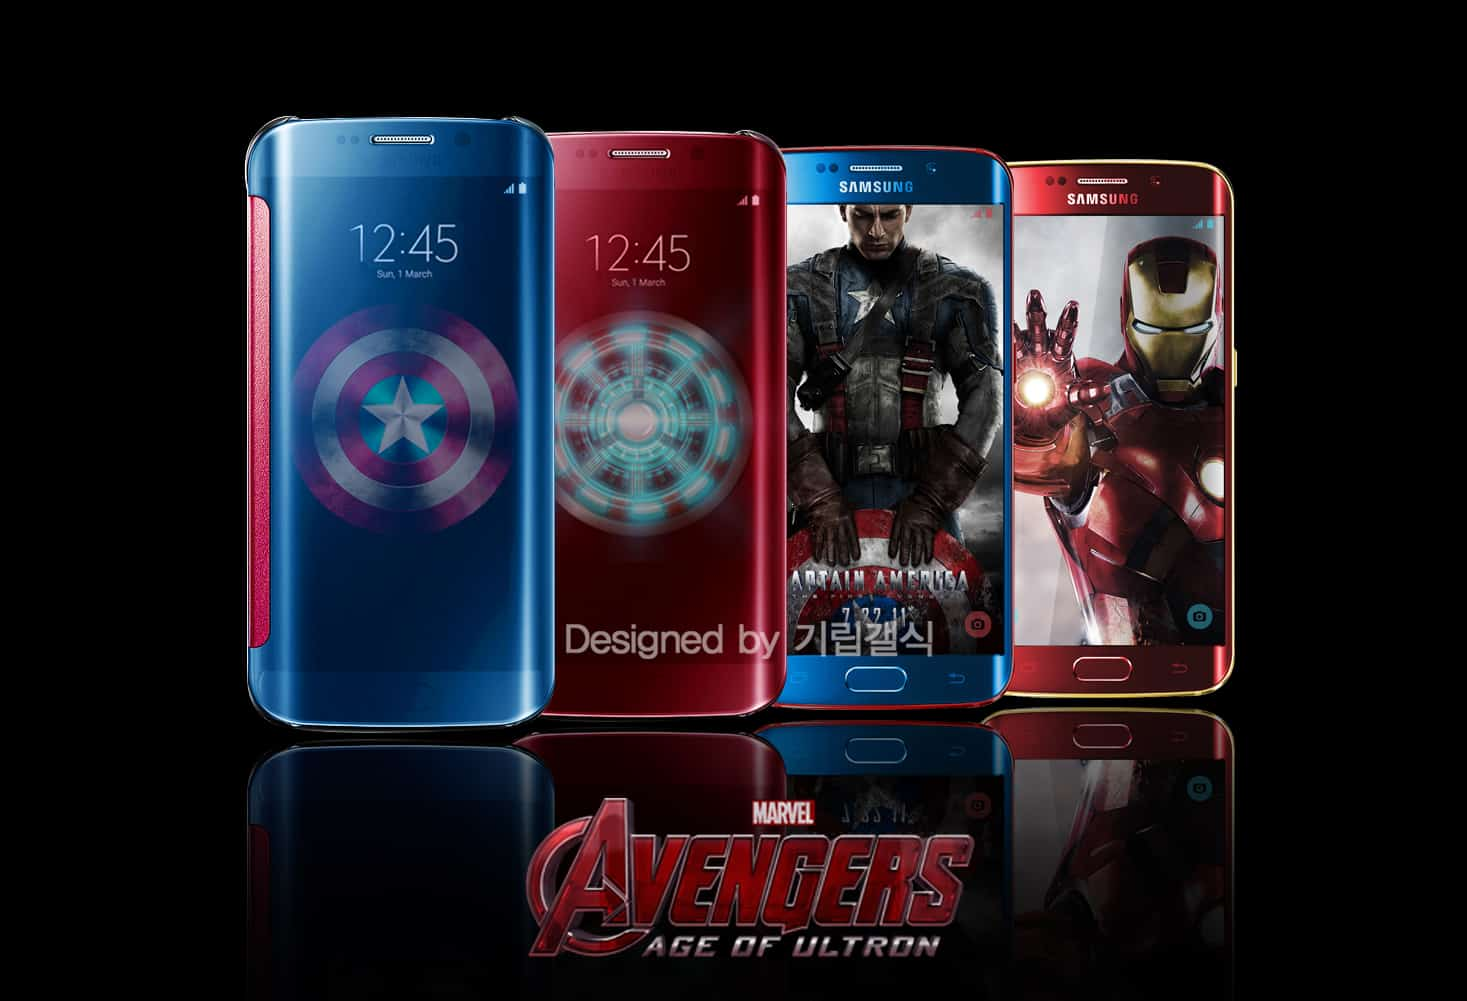 Galaxy S6 Avengers 9